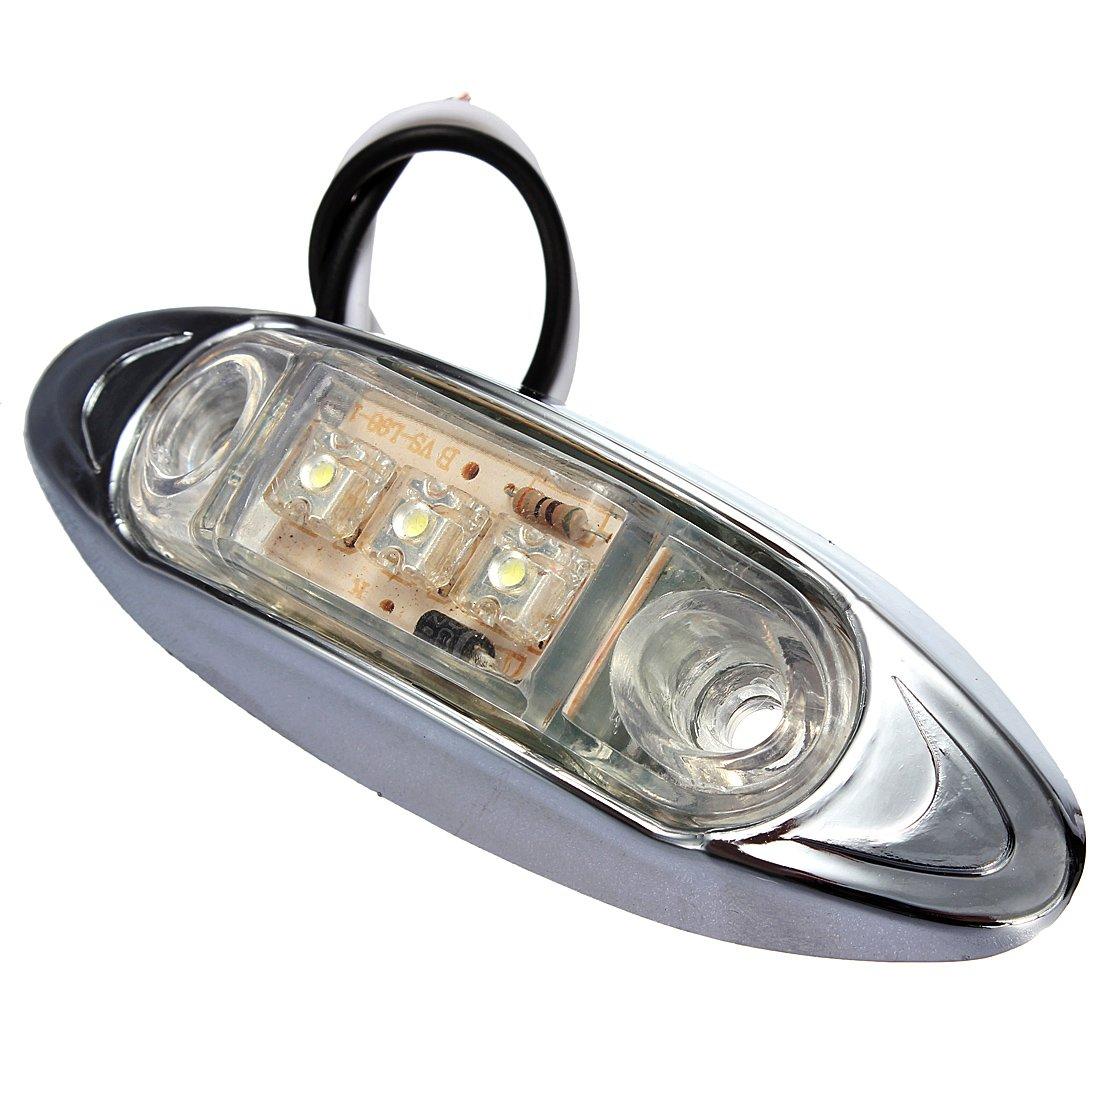 Waterproof 12V LED Side Marker/Clearance Light for Truck/Trailer